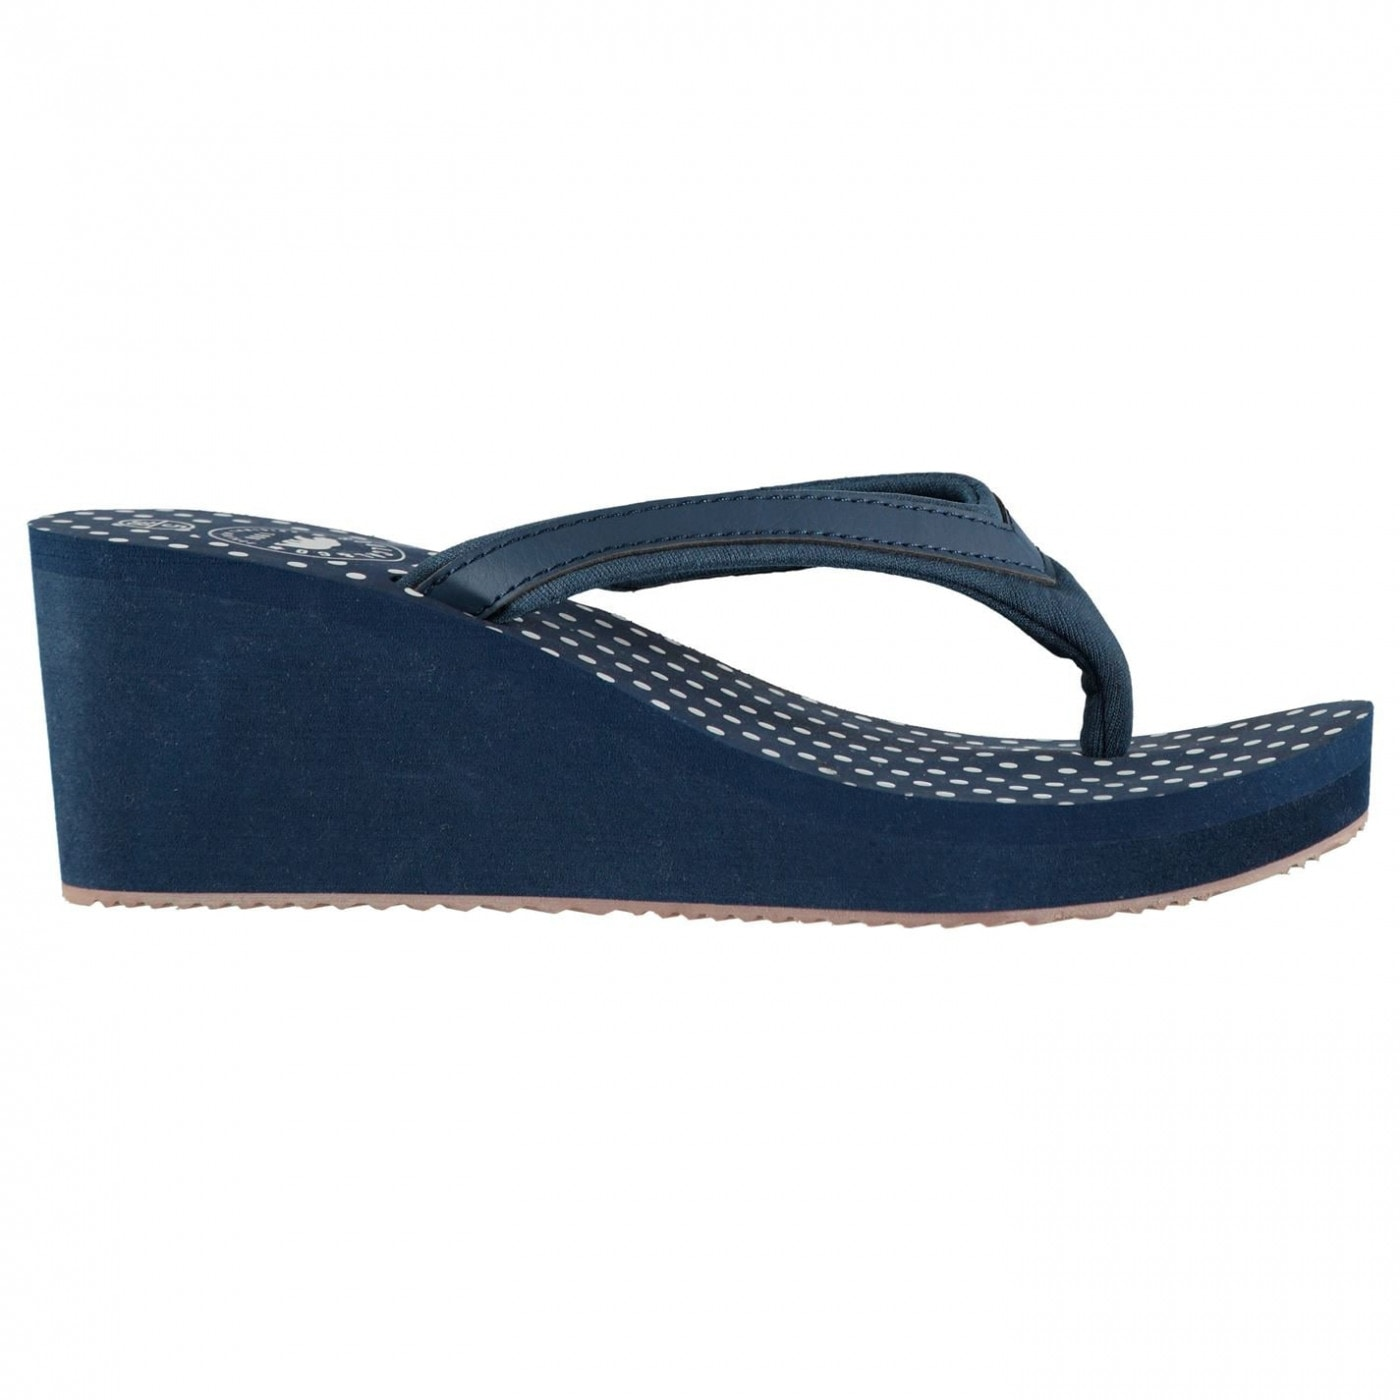 Women's flip-flops SoulCal Eva Wedge